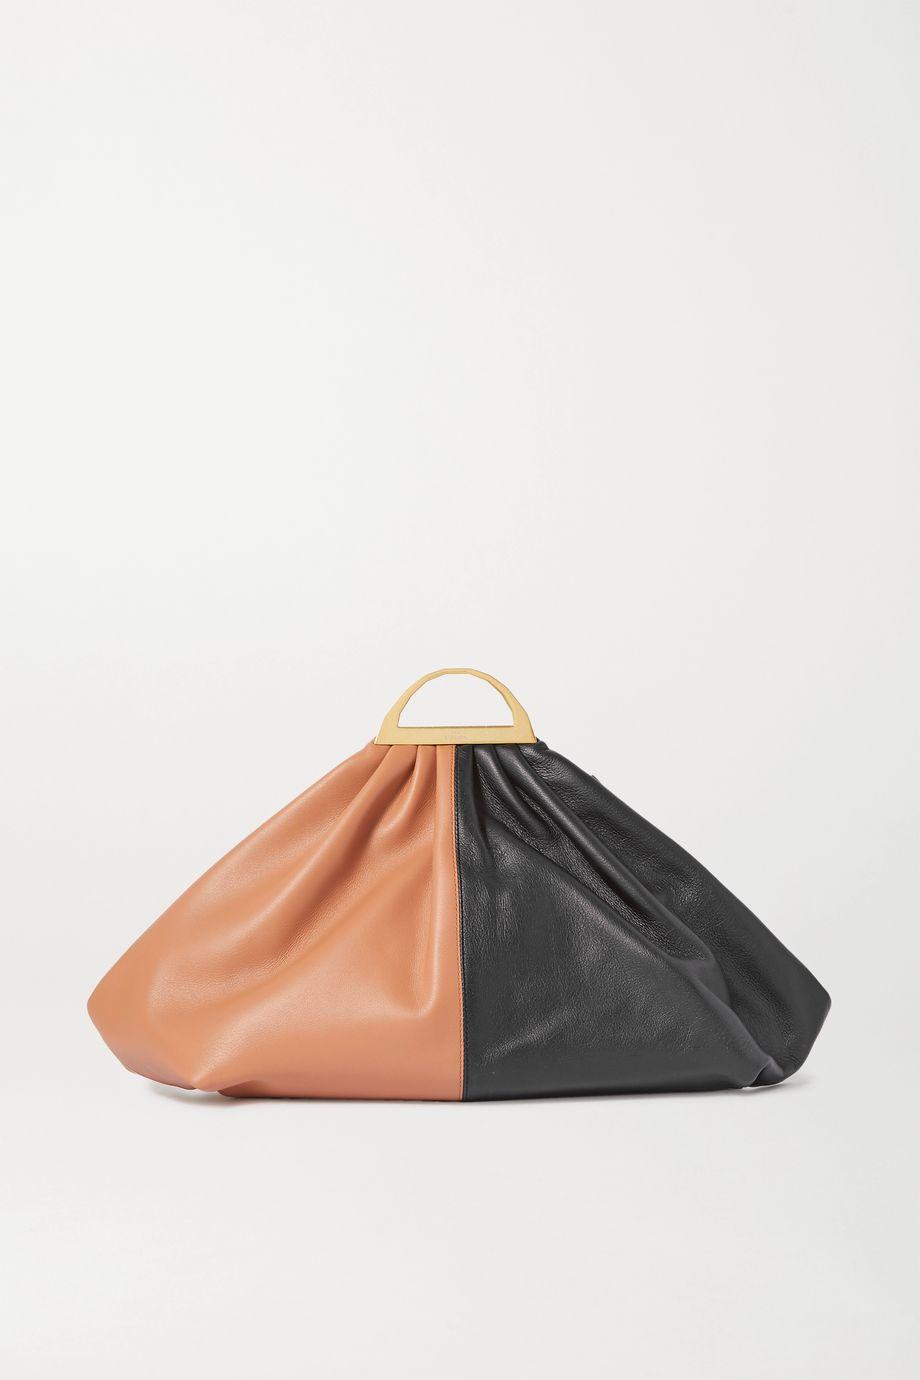 THE VOLON Gabi two-tone leather clutch